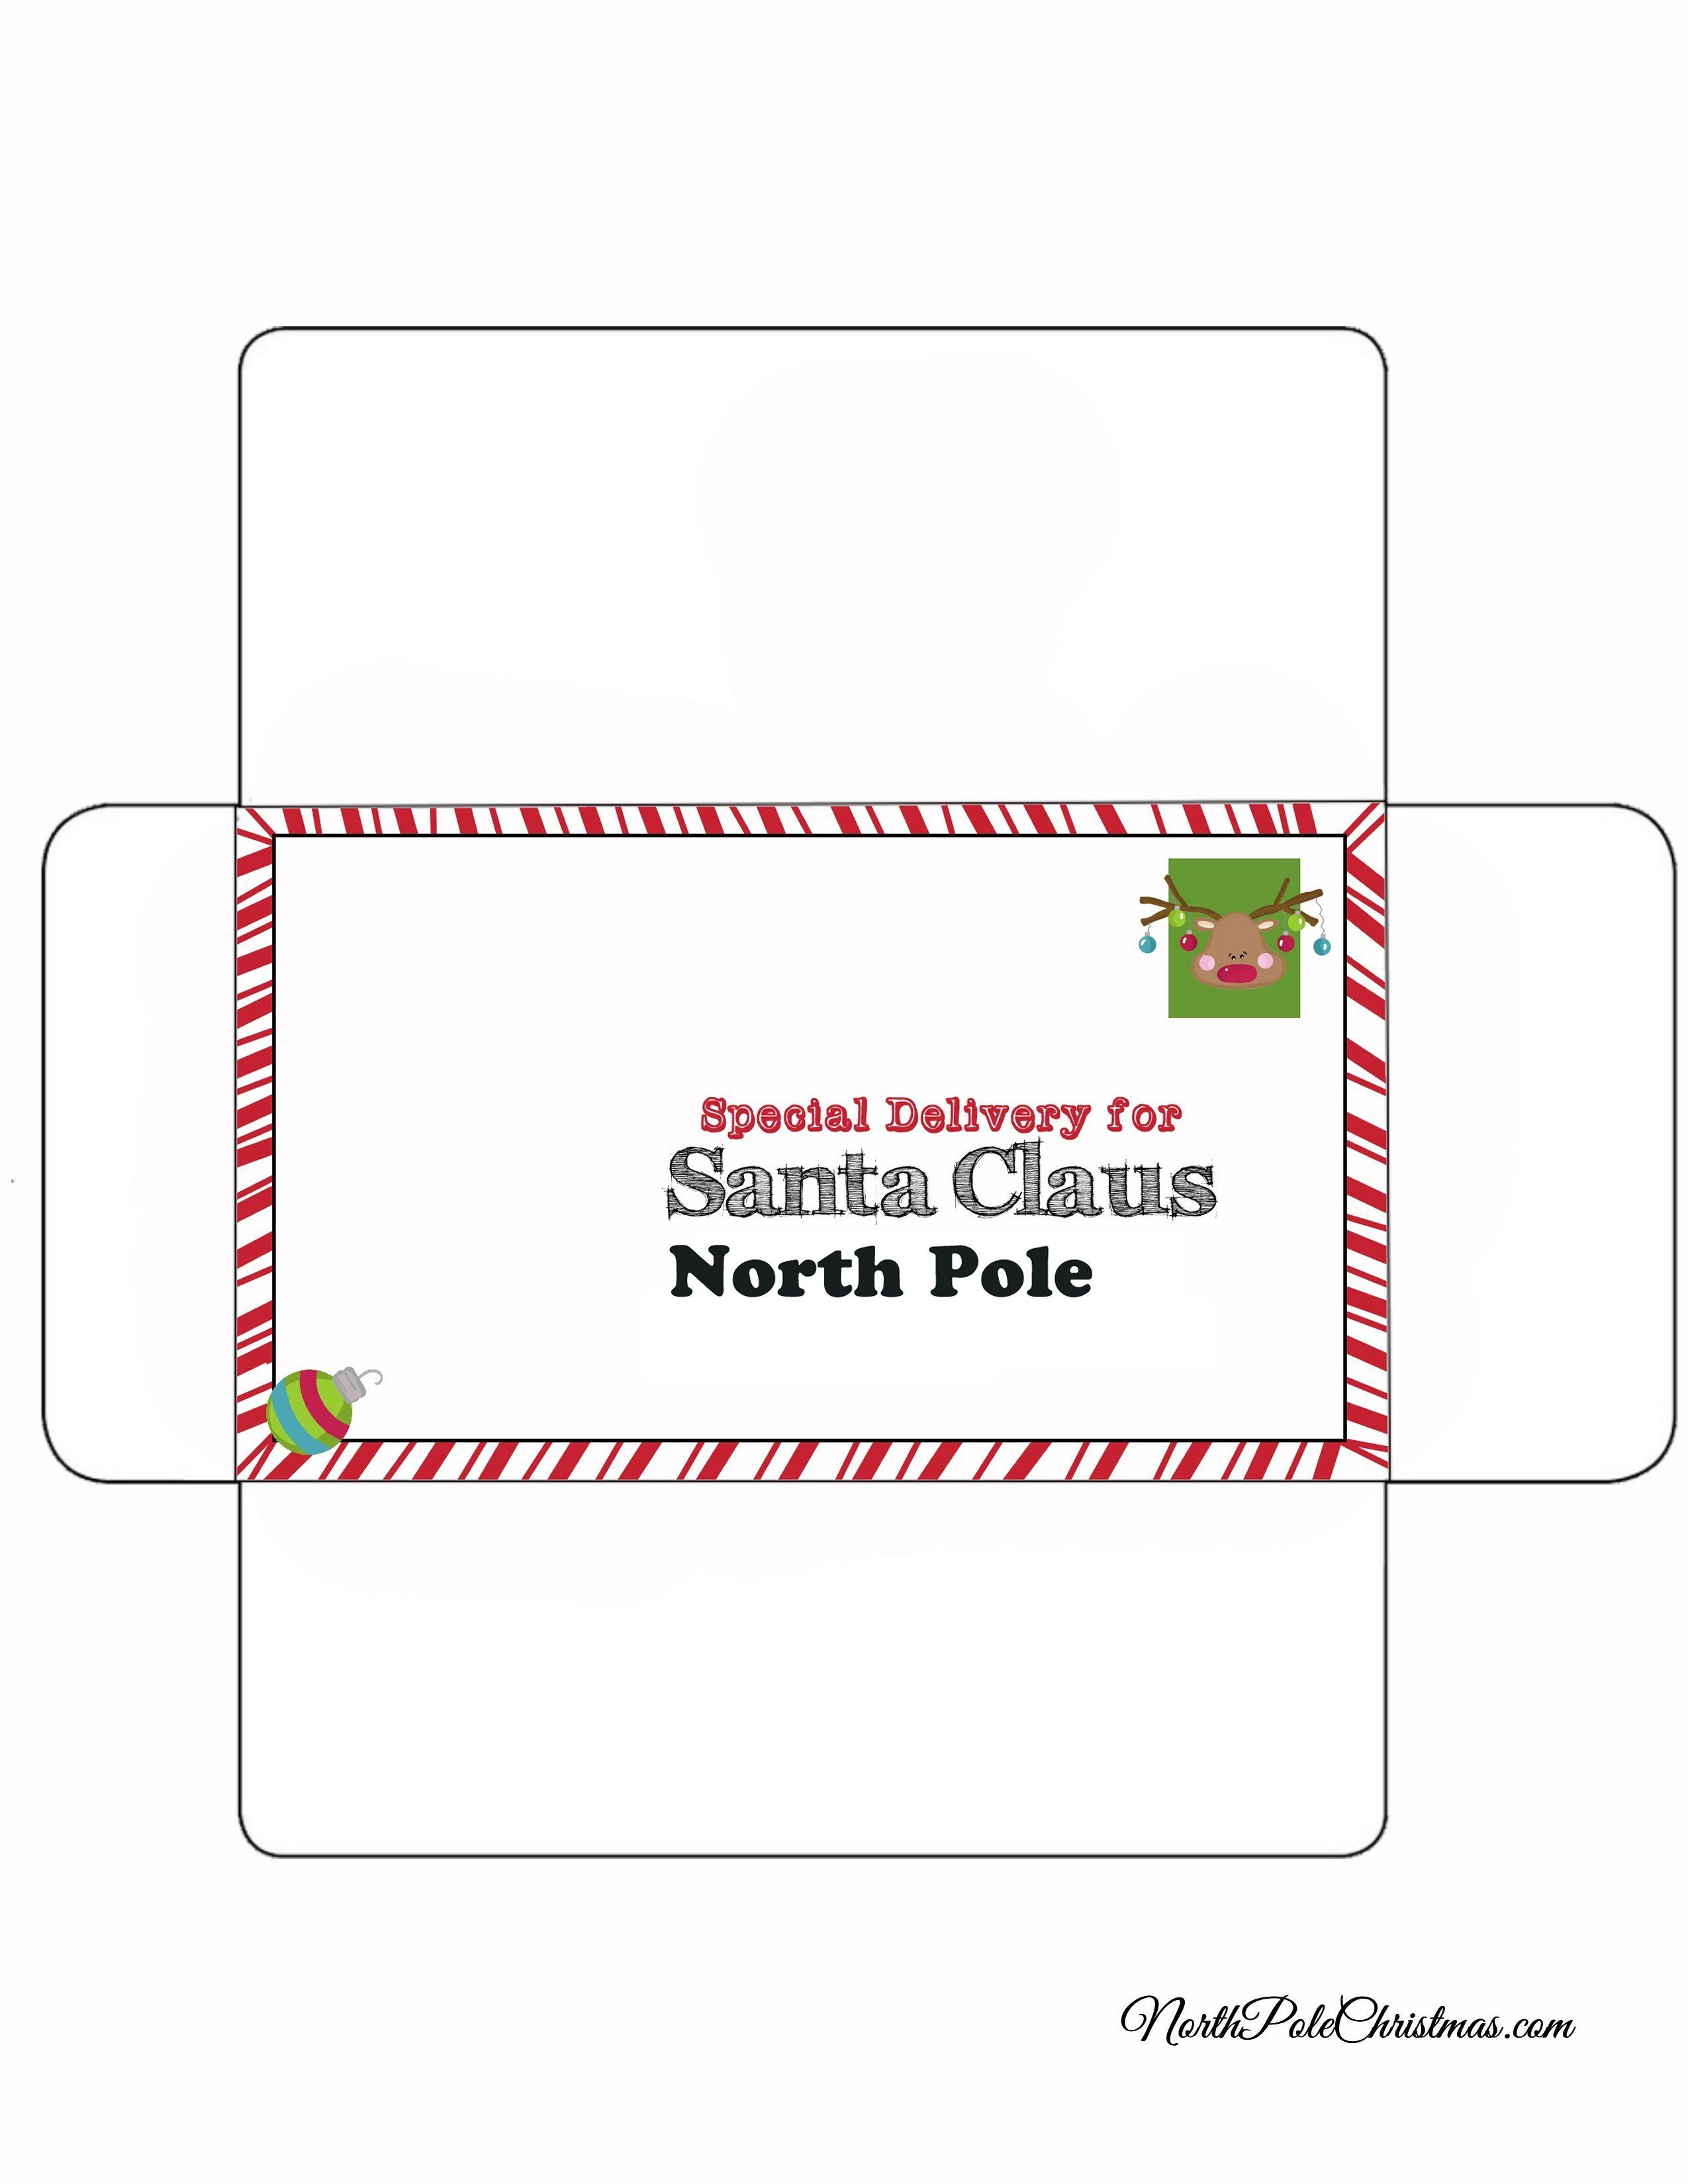 Santa envelope insrenterprises santa envelope pronofoot35fo Image collections